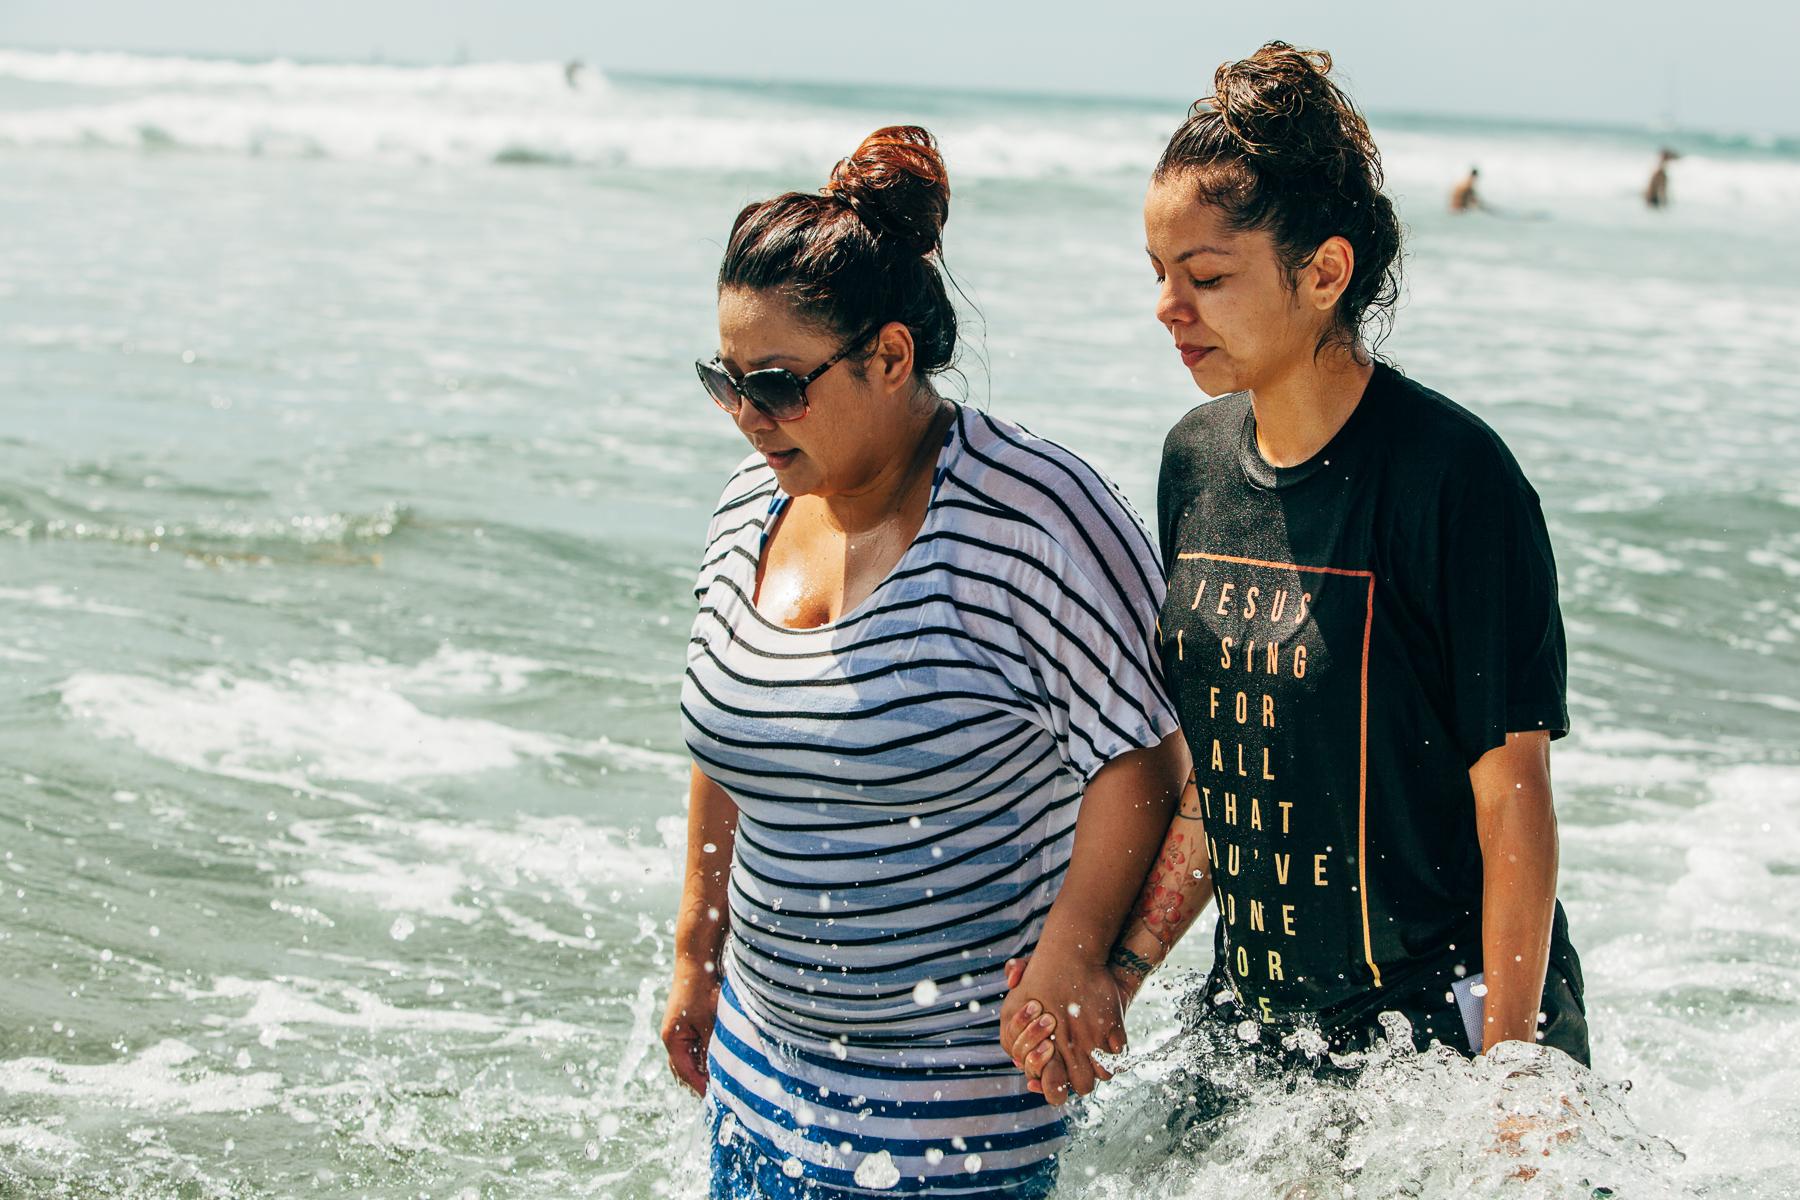 Beach_Baptism_2015_93.jpg